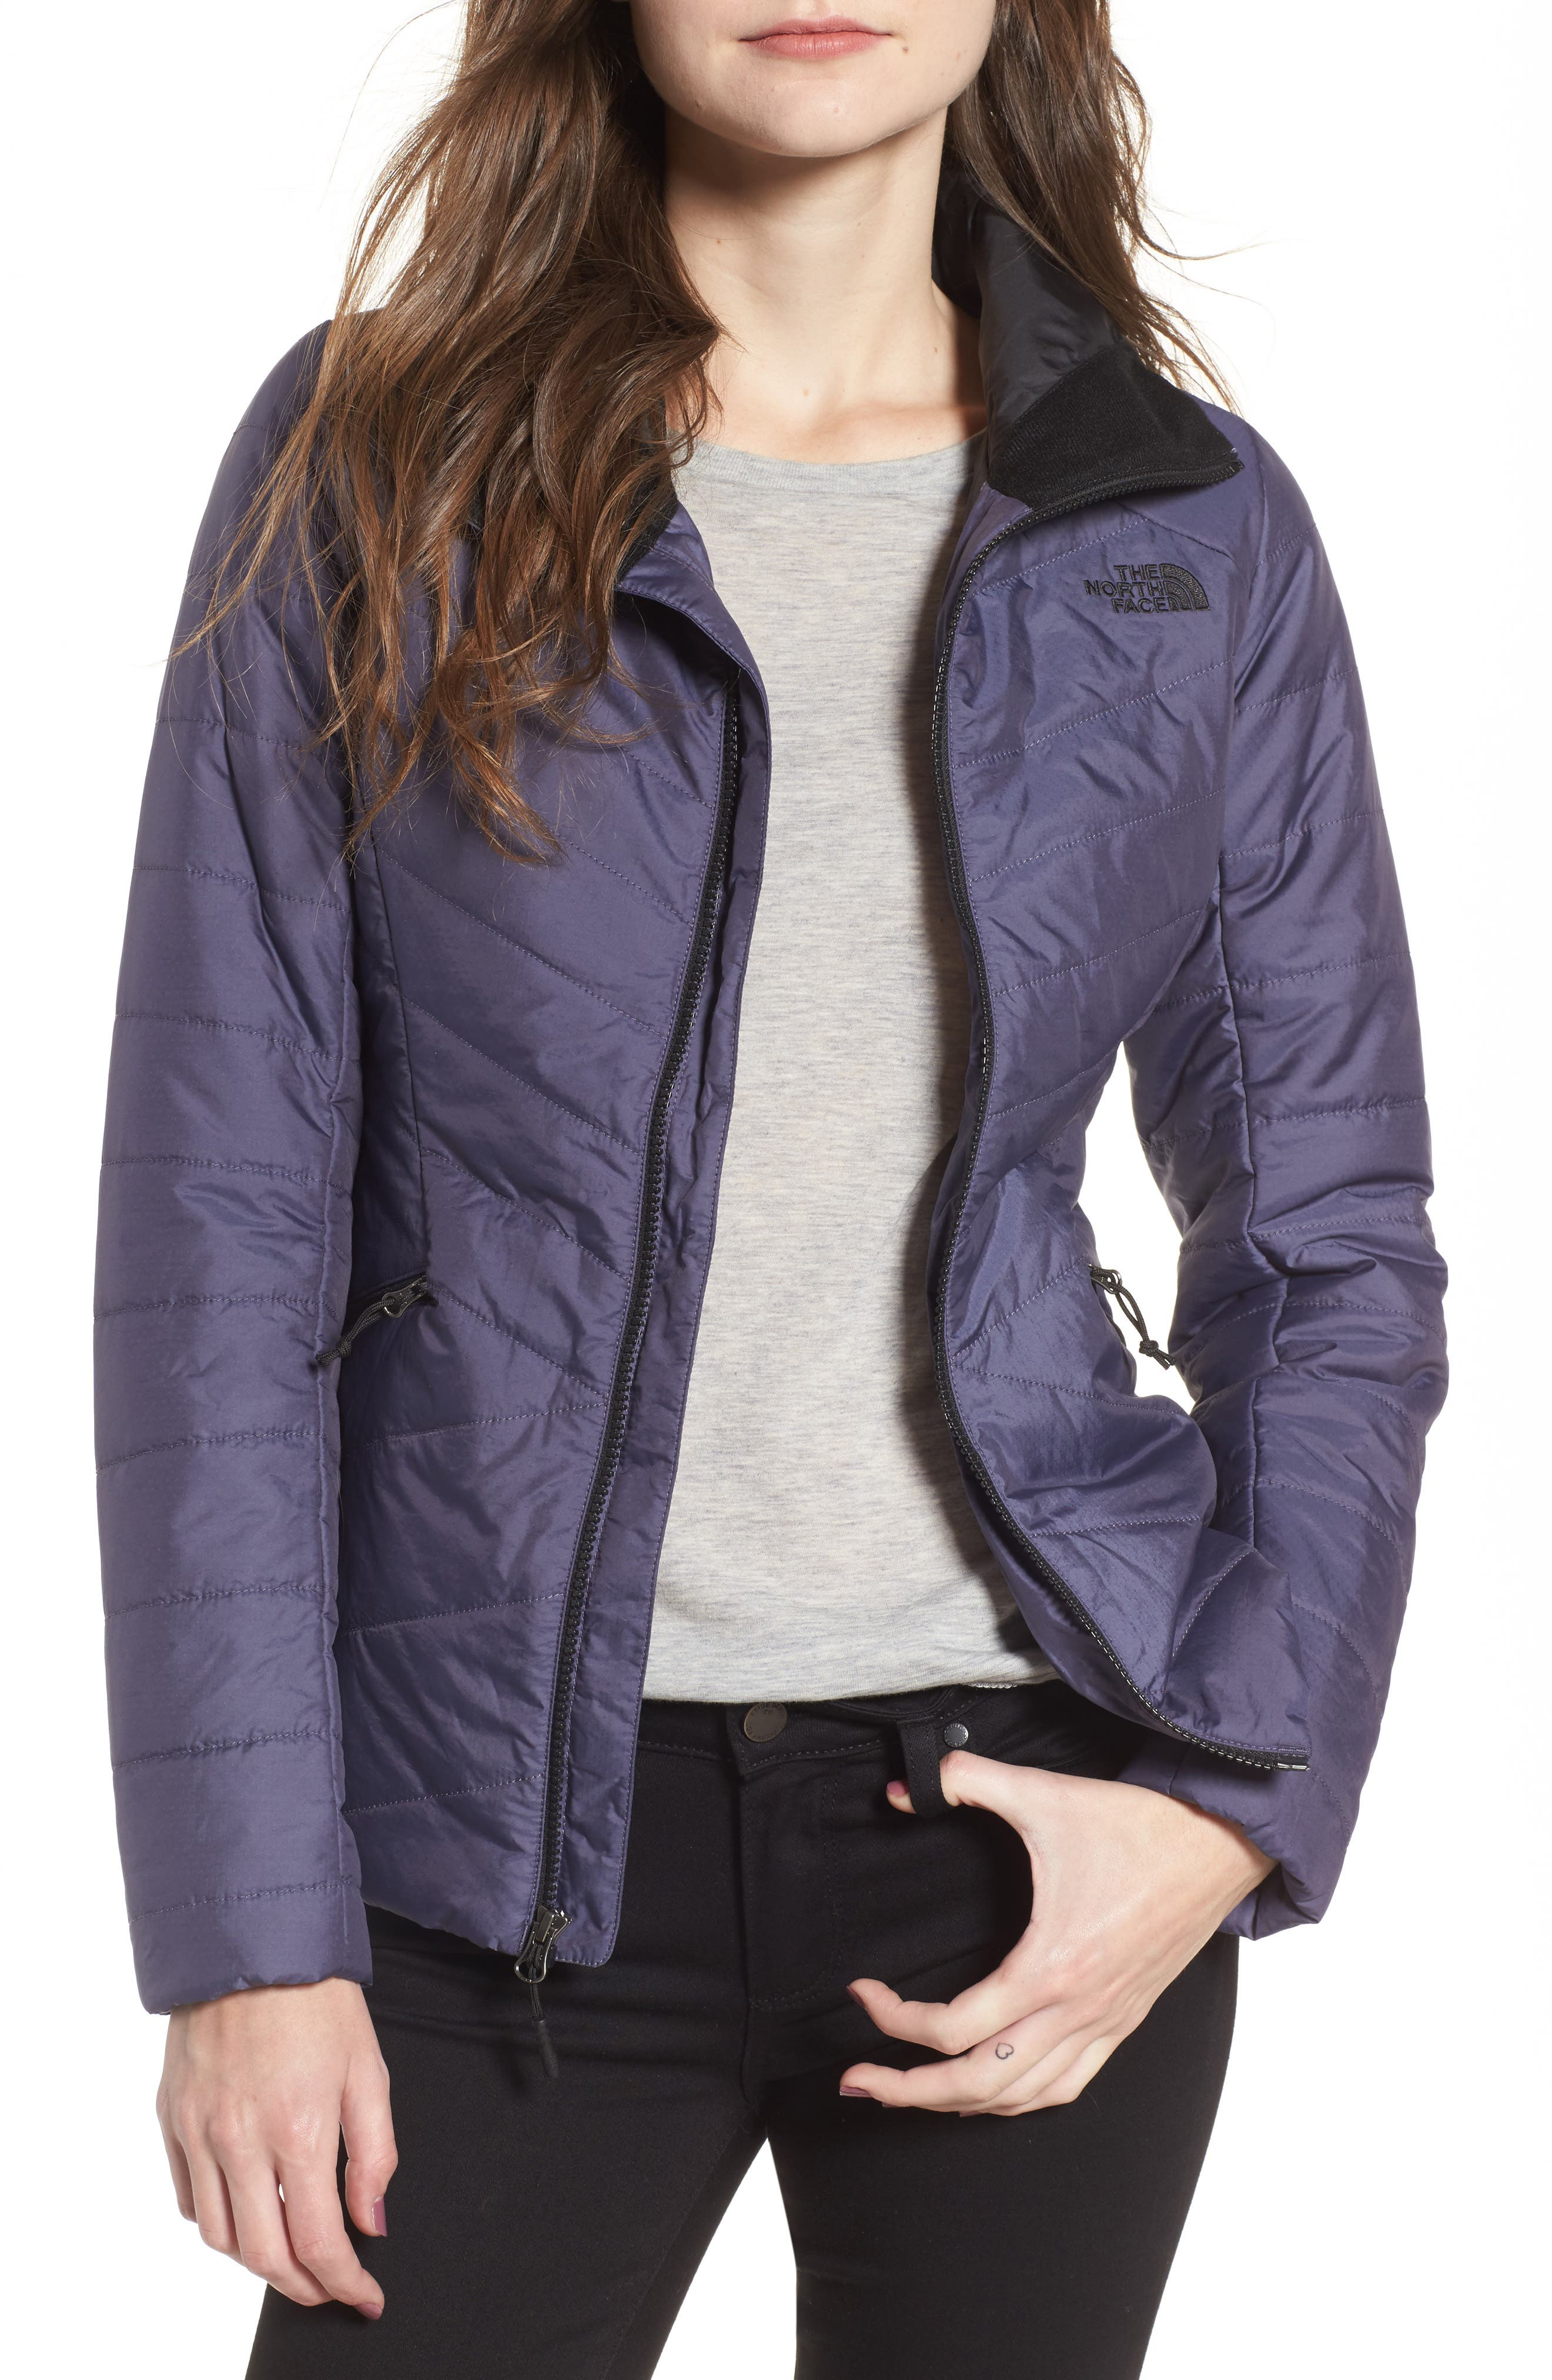 Main Image - The North Face Moonlight Heatseeker Insulated Jacket